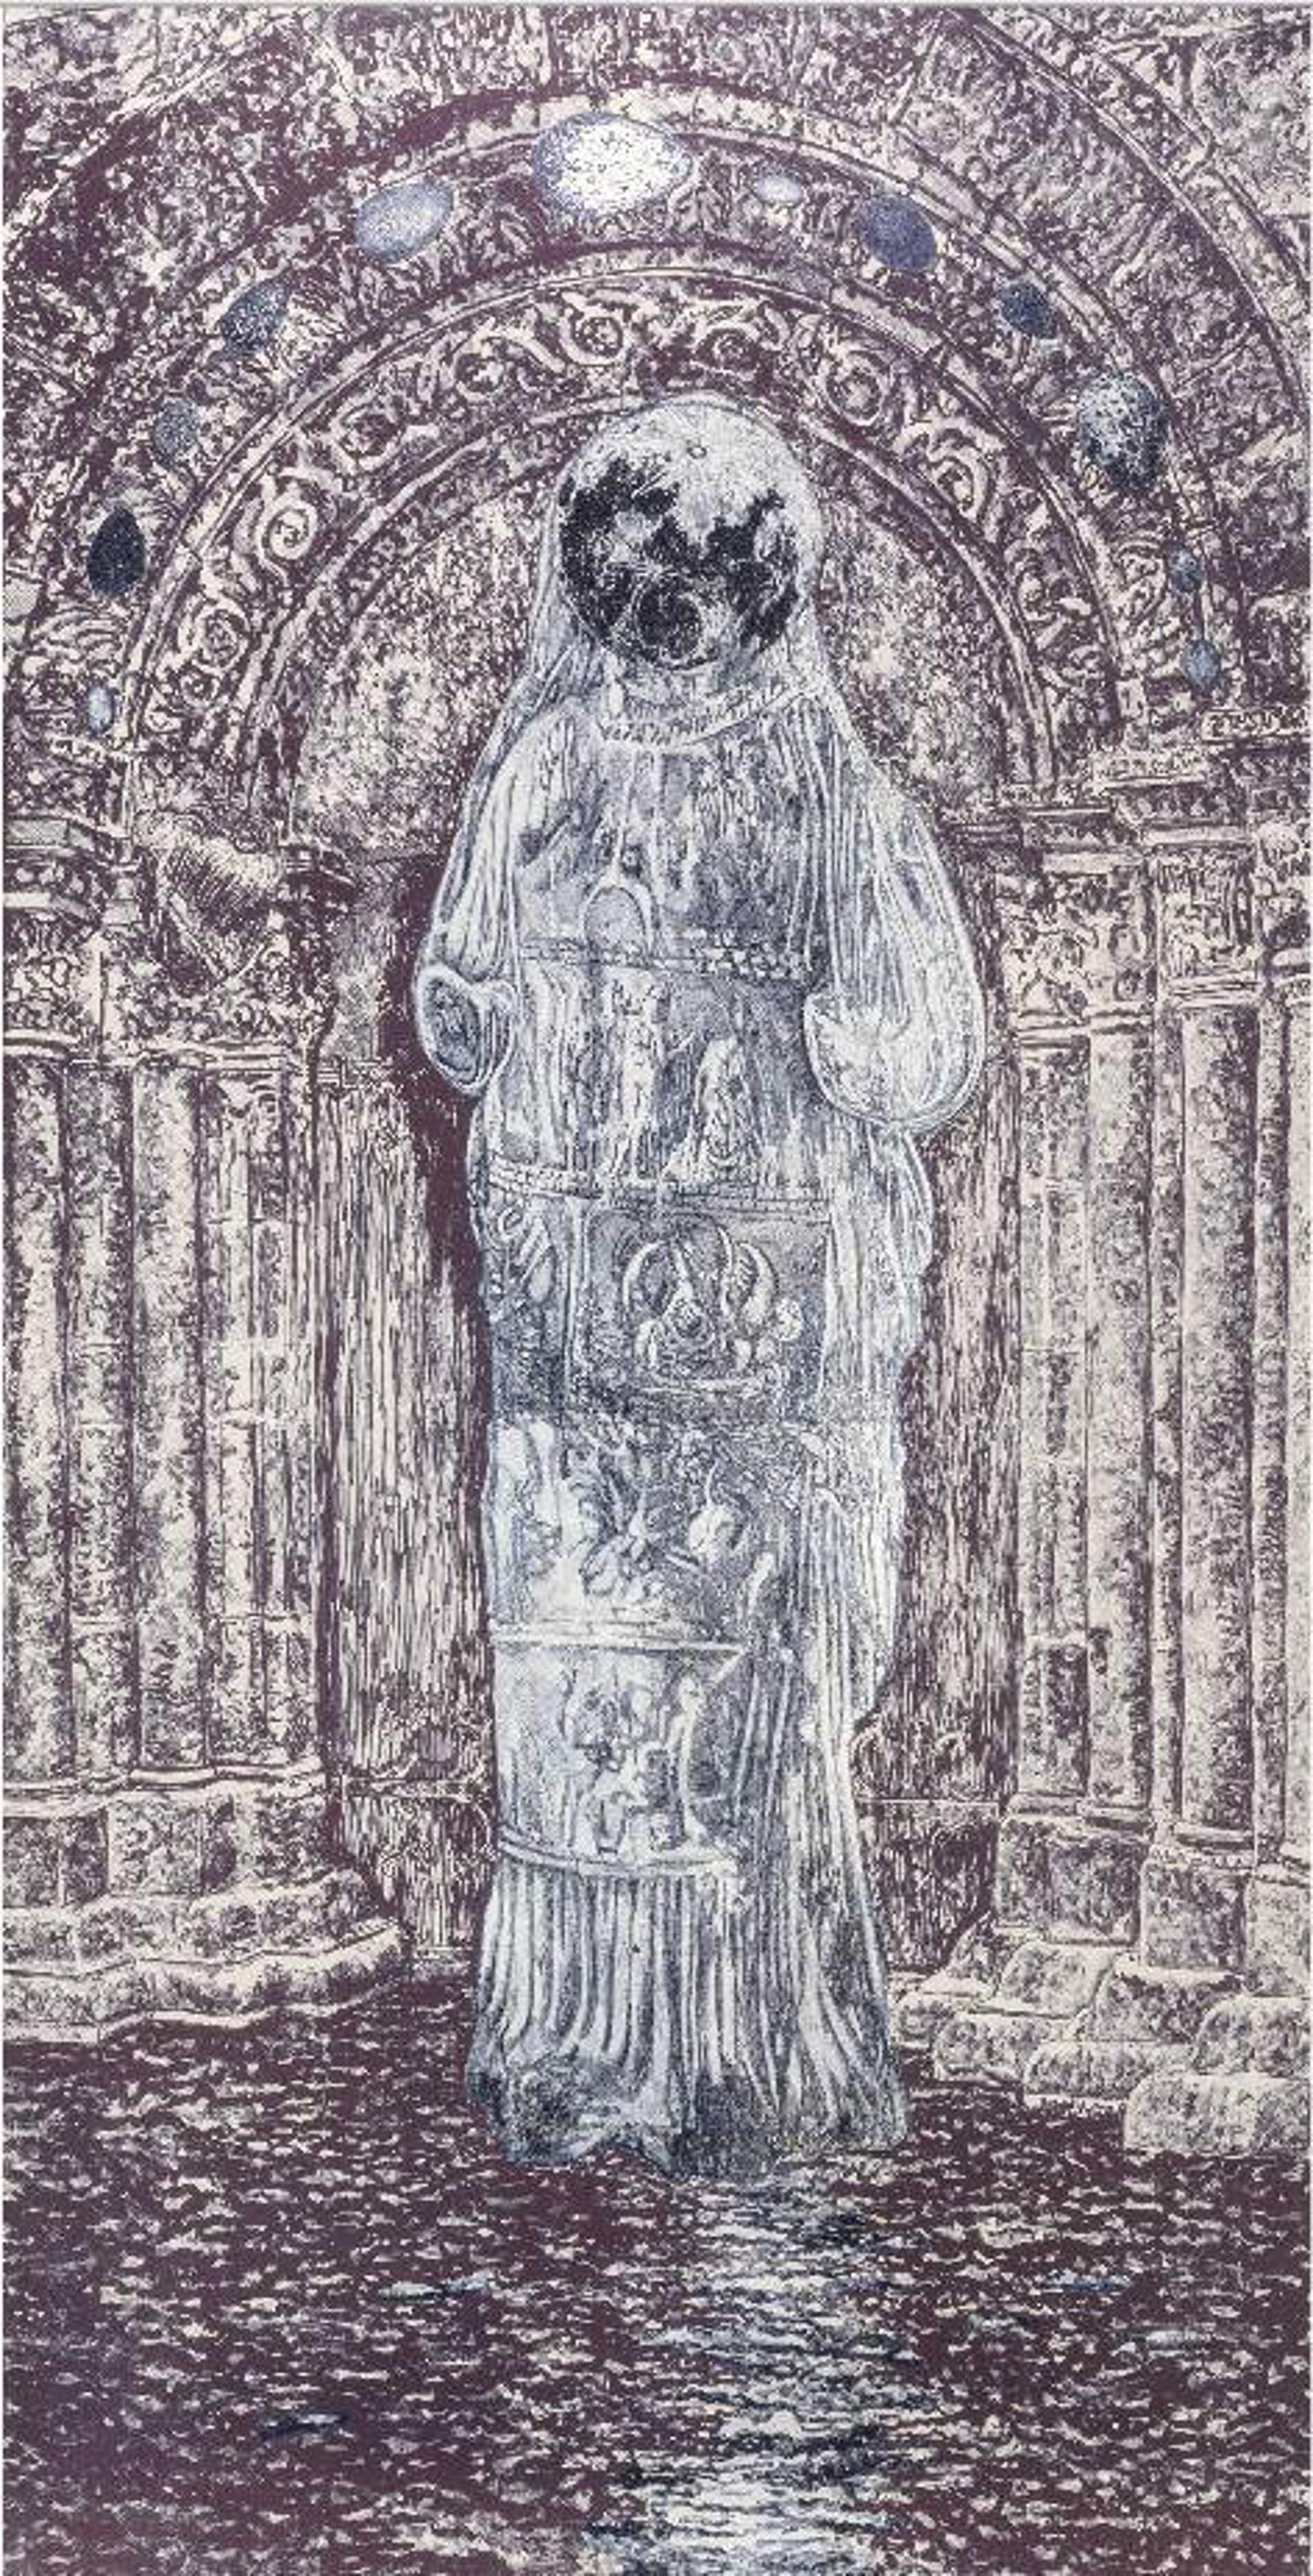 Alchemical Doors for C.A. Meier l (Moon Goddess) by Ann McCoy